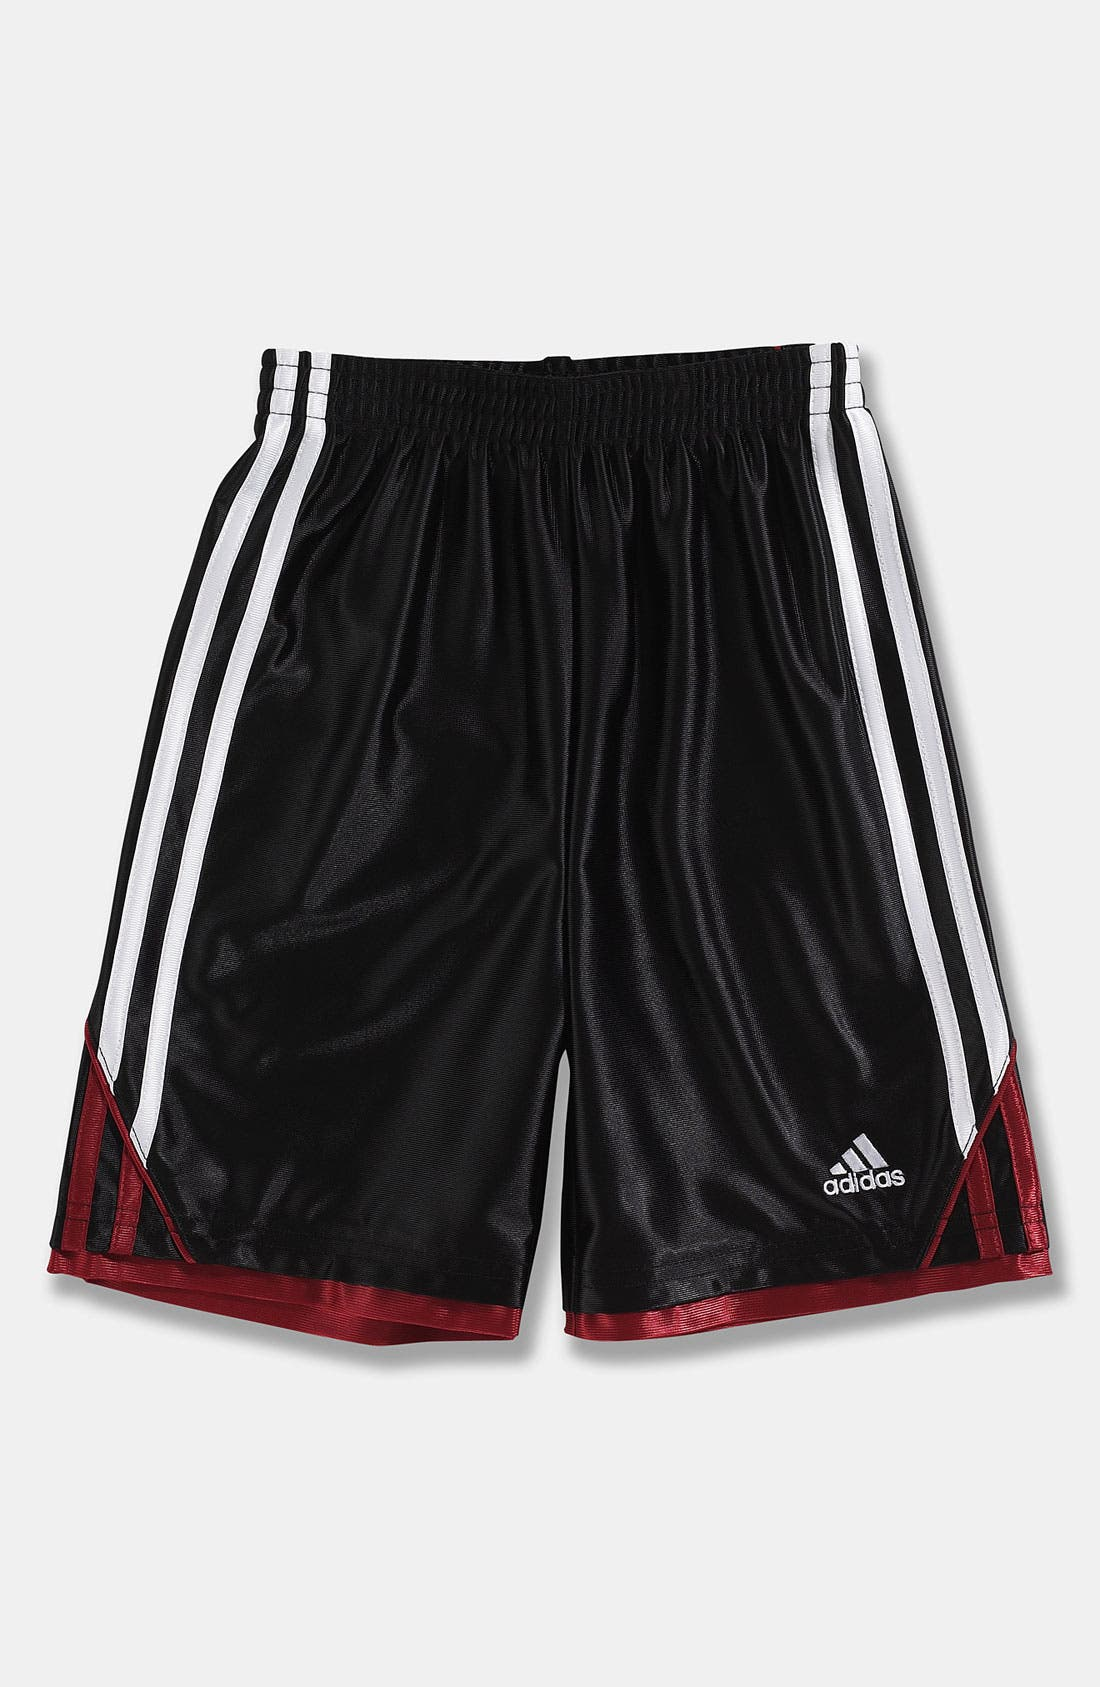 Alternate Image 1 Selected - adidas 'Prime Dazzle' Shorts (Little Boys)